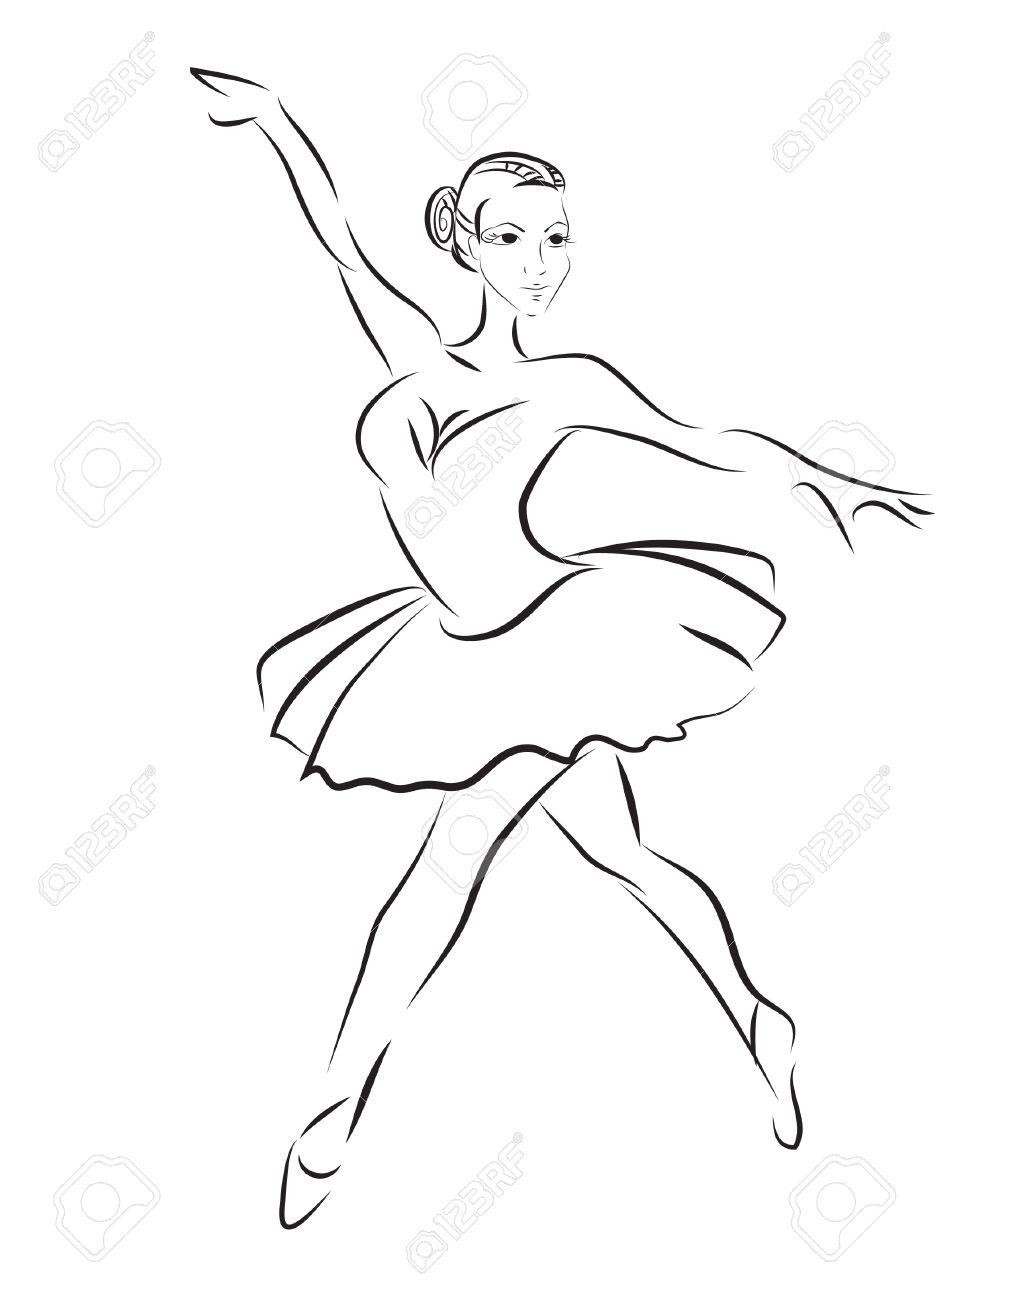 1010x1300 Contour Sketch Of Ballet Dancer Royalty Free Cliparts, Vectors